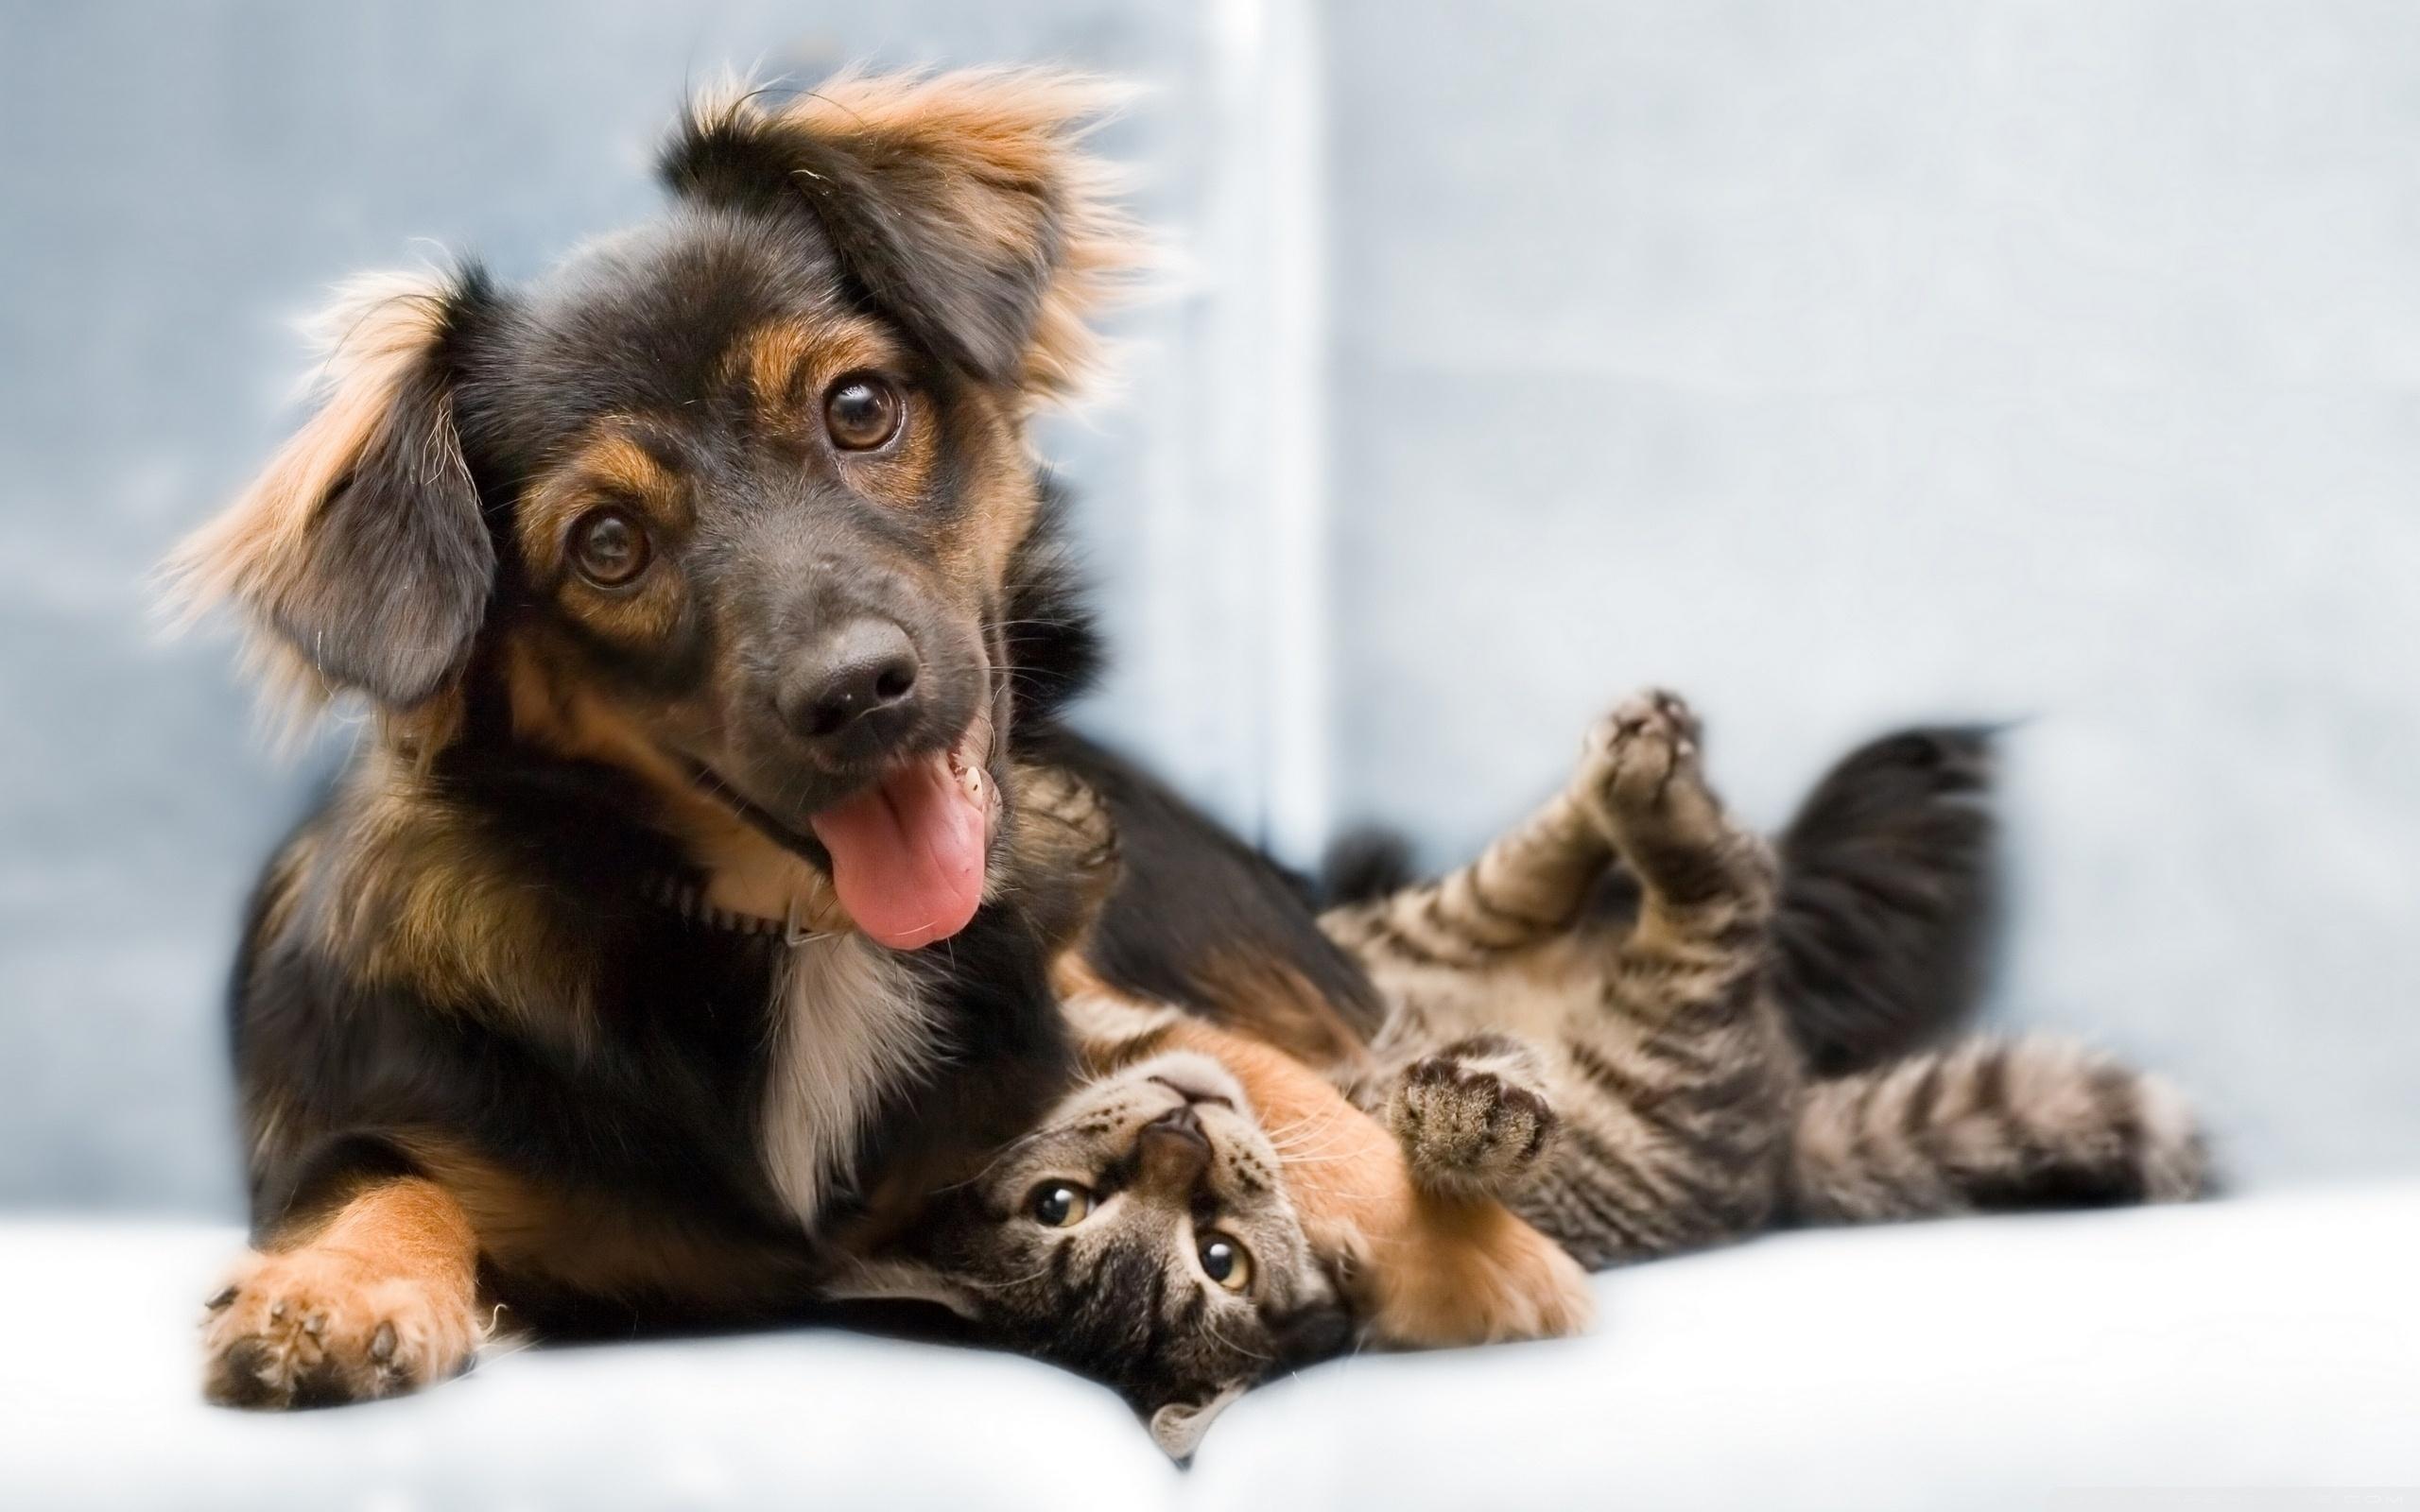 dog and cat friendship ❤ 4k hd desktop wallpaper for 4k ultra hd tv